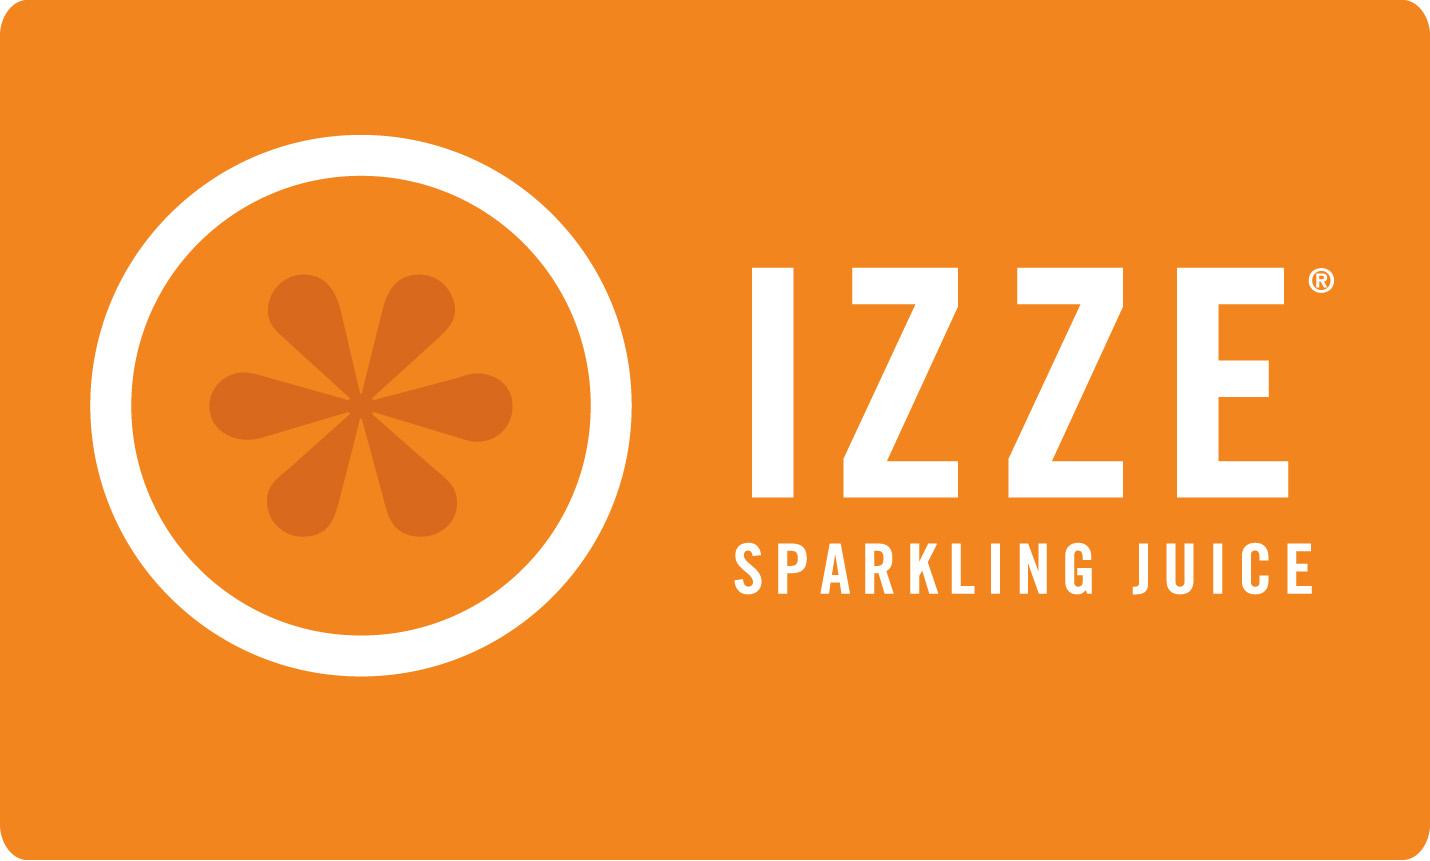 IZZE sparkling juice